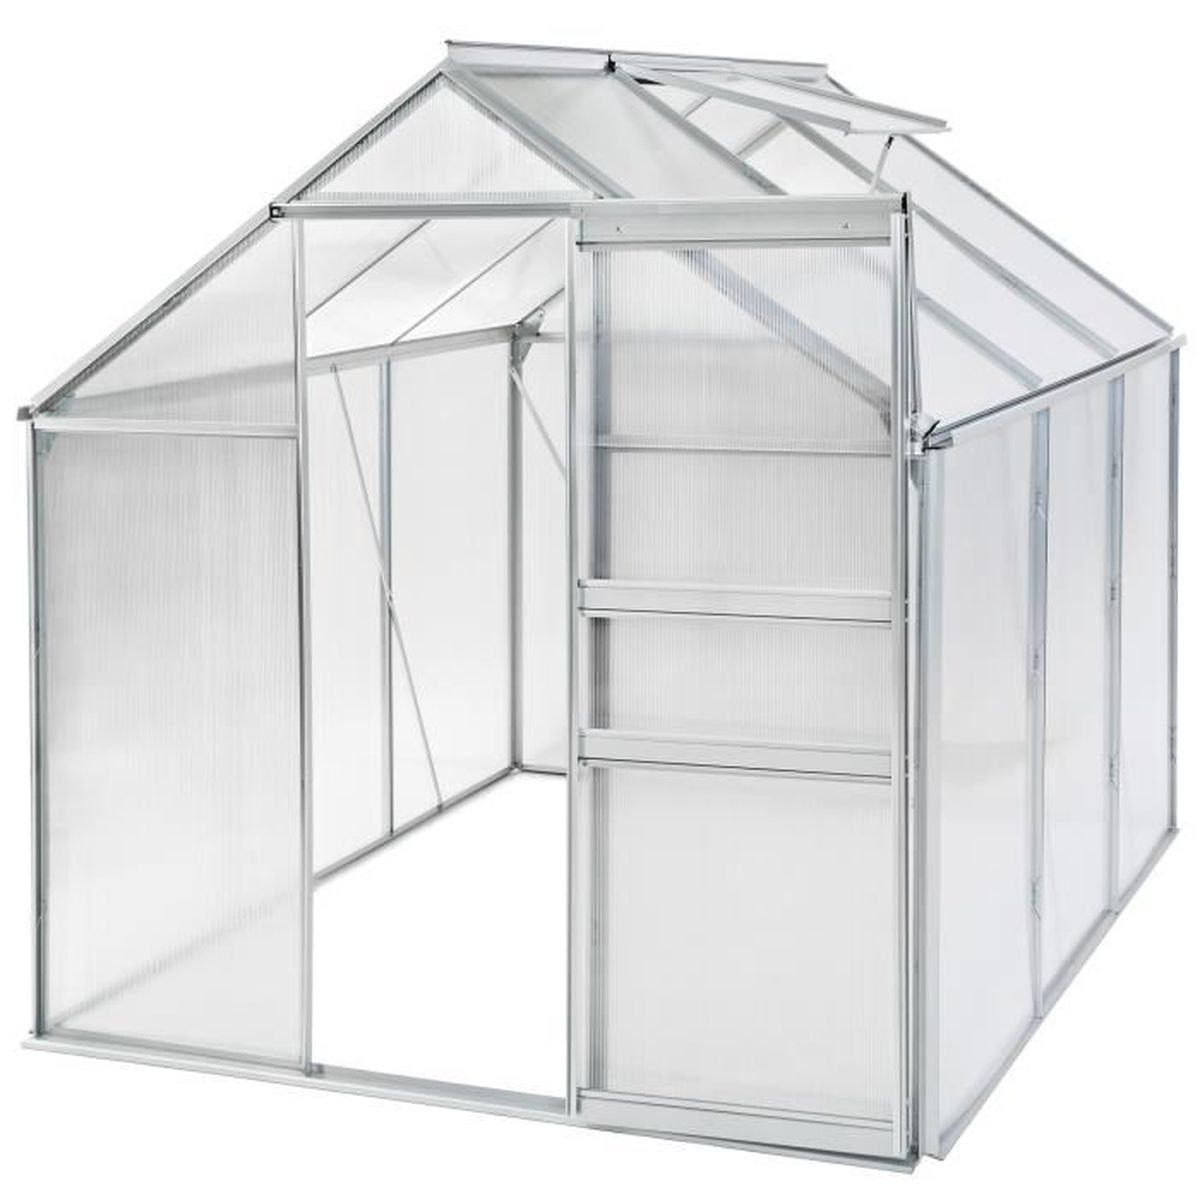 Serre de jardin aluminium 190x190x195 cm